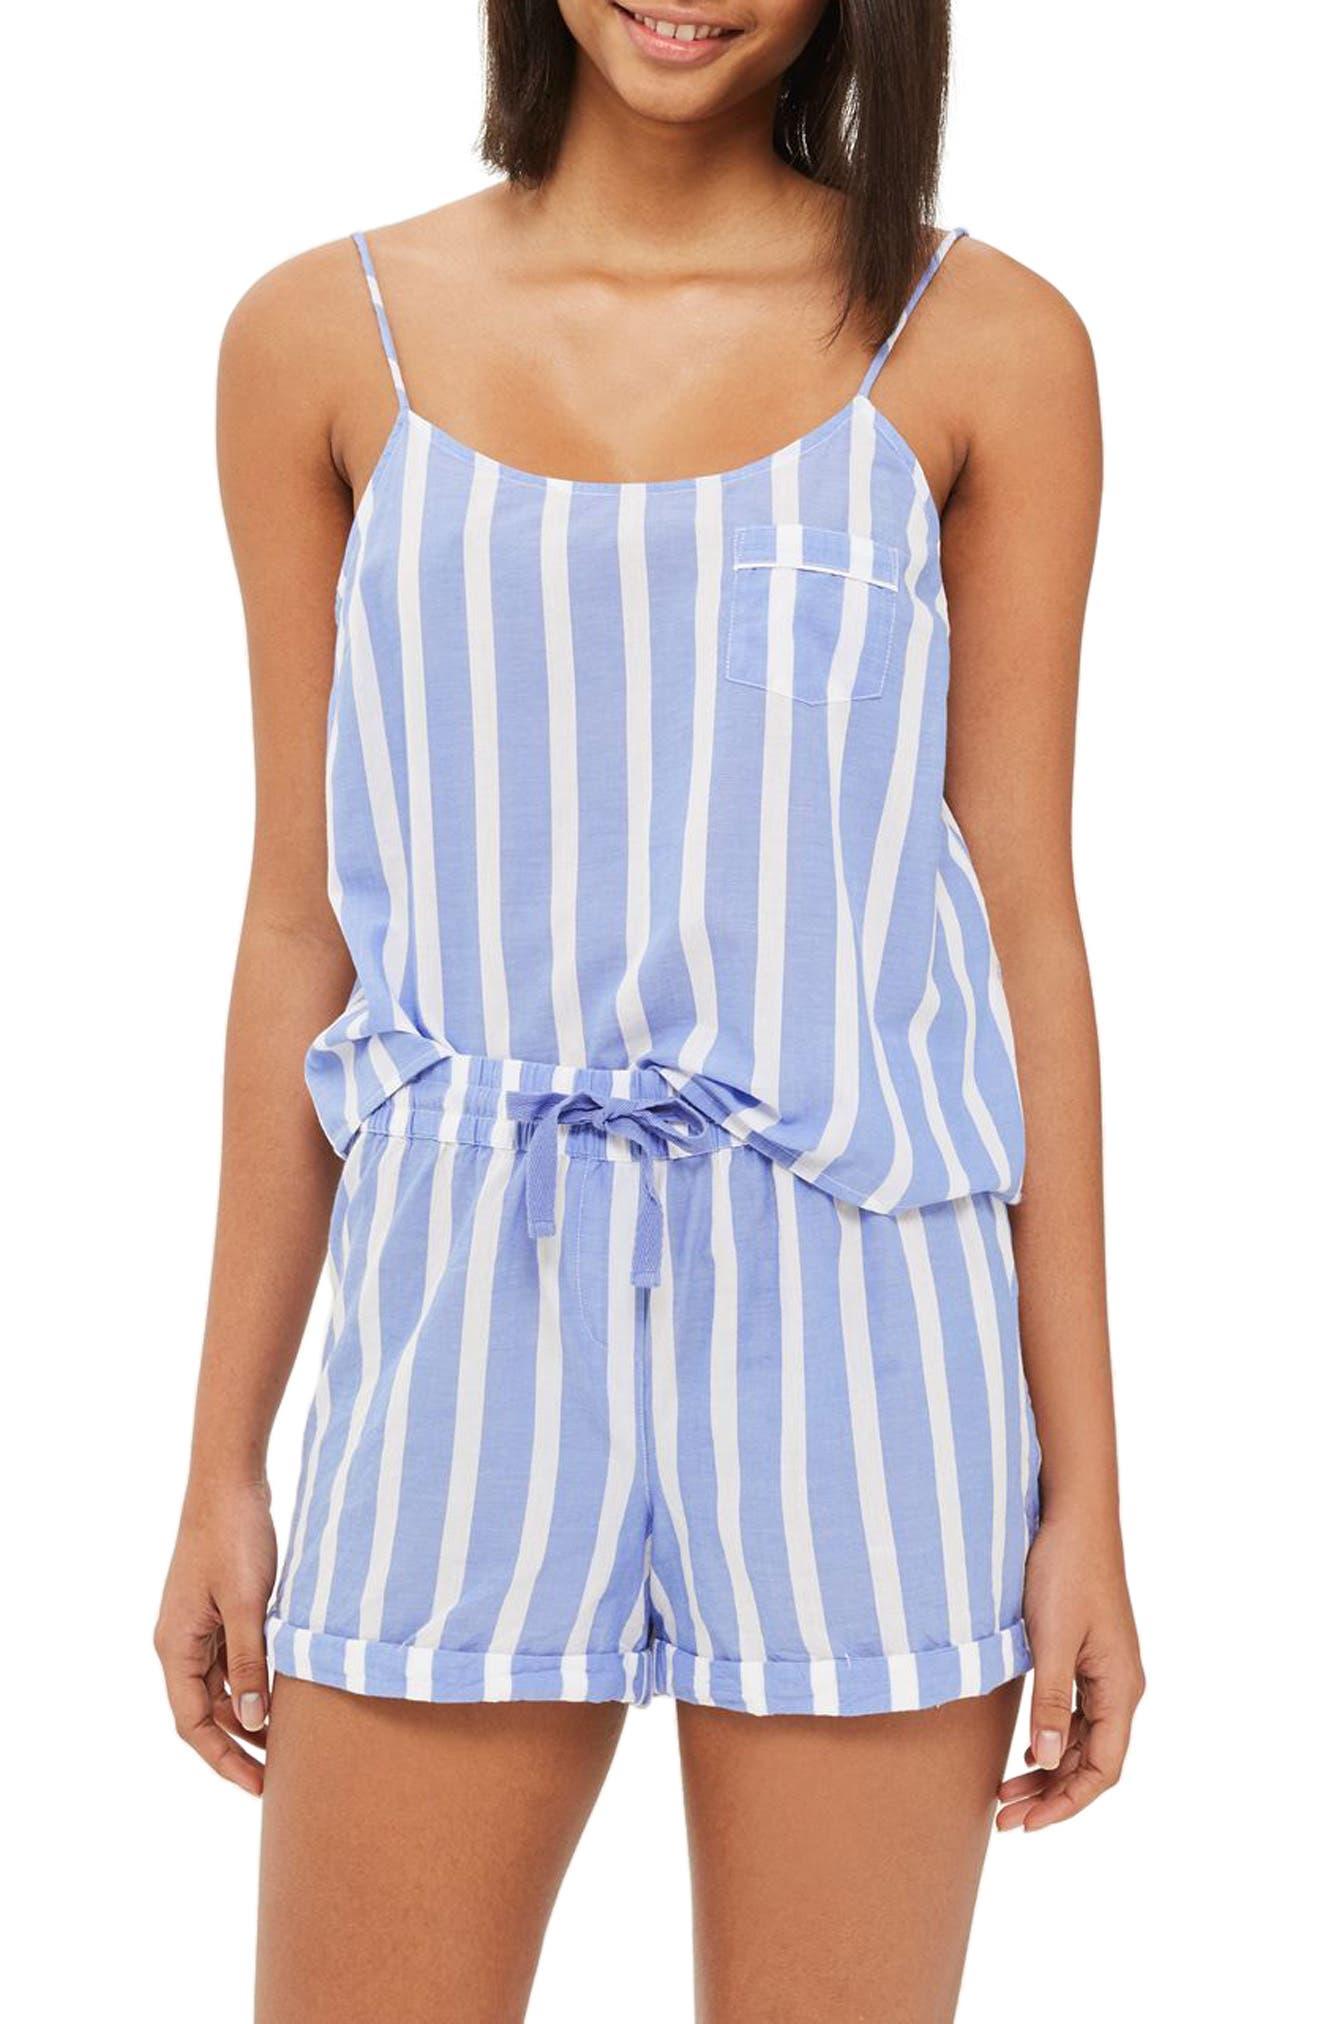 Topshop Stripe Pajama Camisole